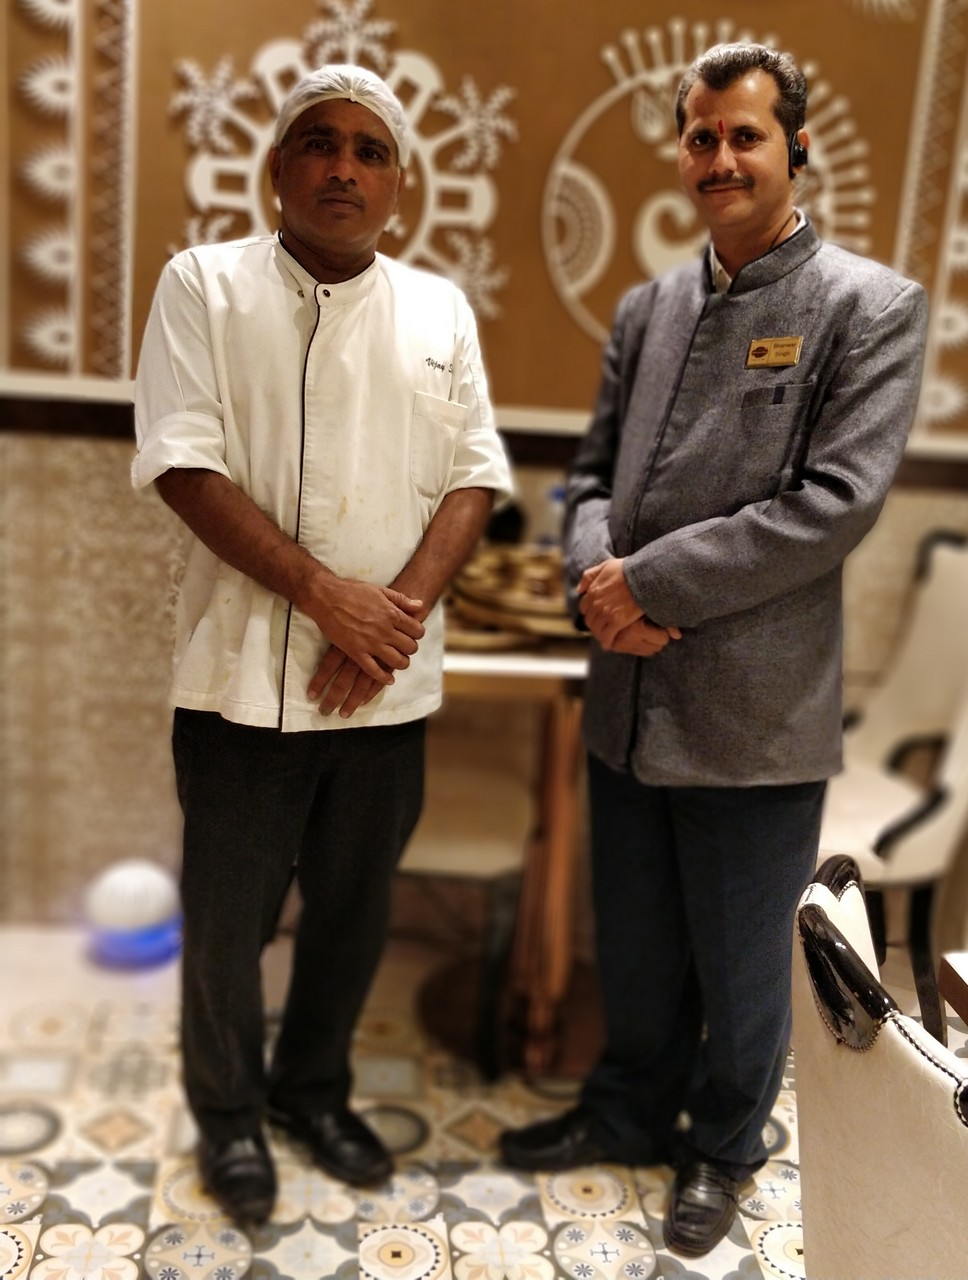 Vijay Singh and Bhanwar Singh